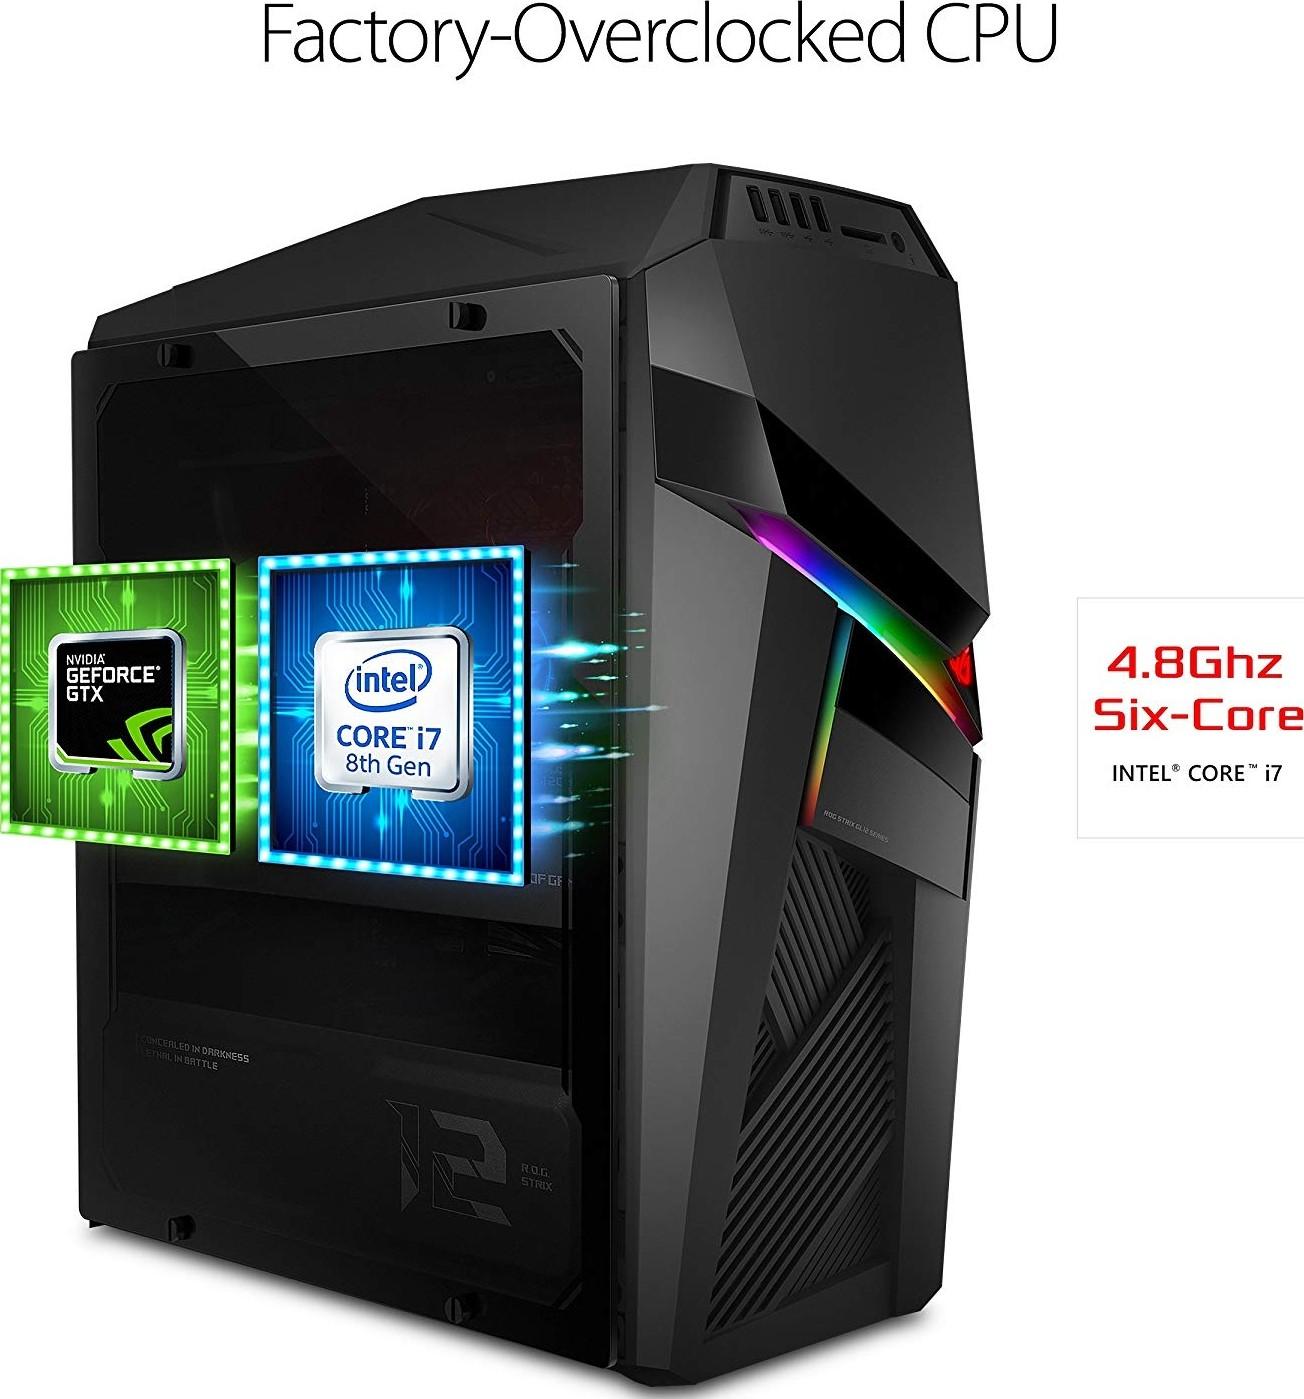 Asus ROG Strix Gaming PC Desktop GL12CM , Overclocked Intel Core i7 8700K,  NVIDIA GeForce GTX 1080 8